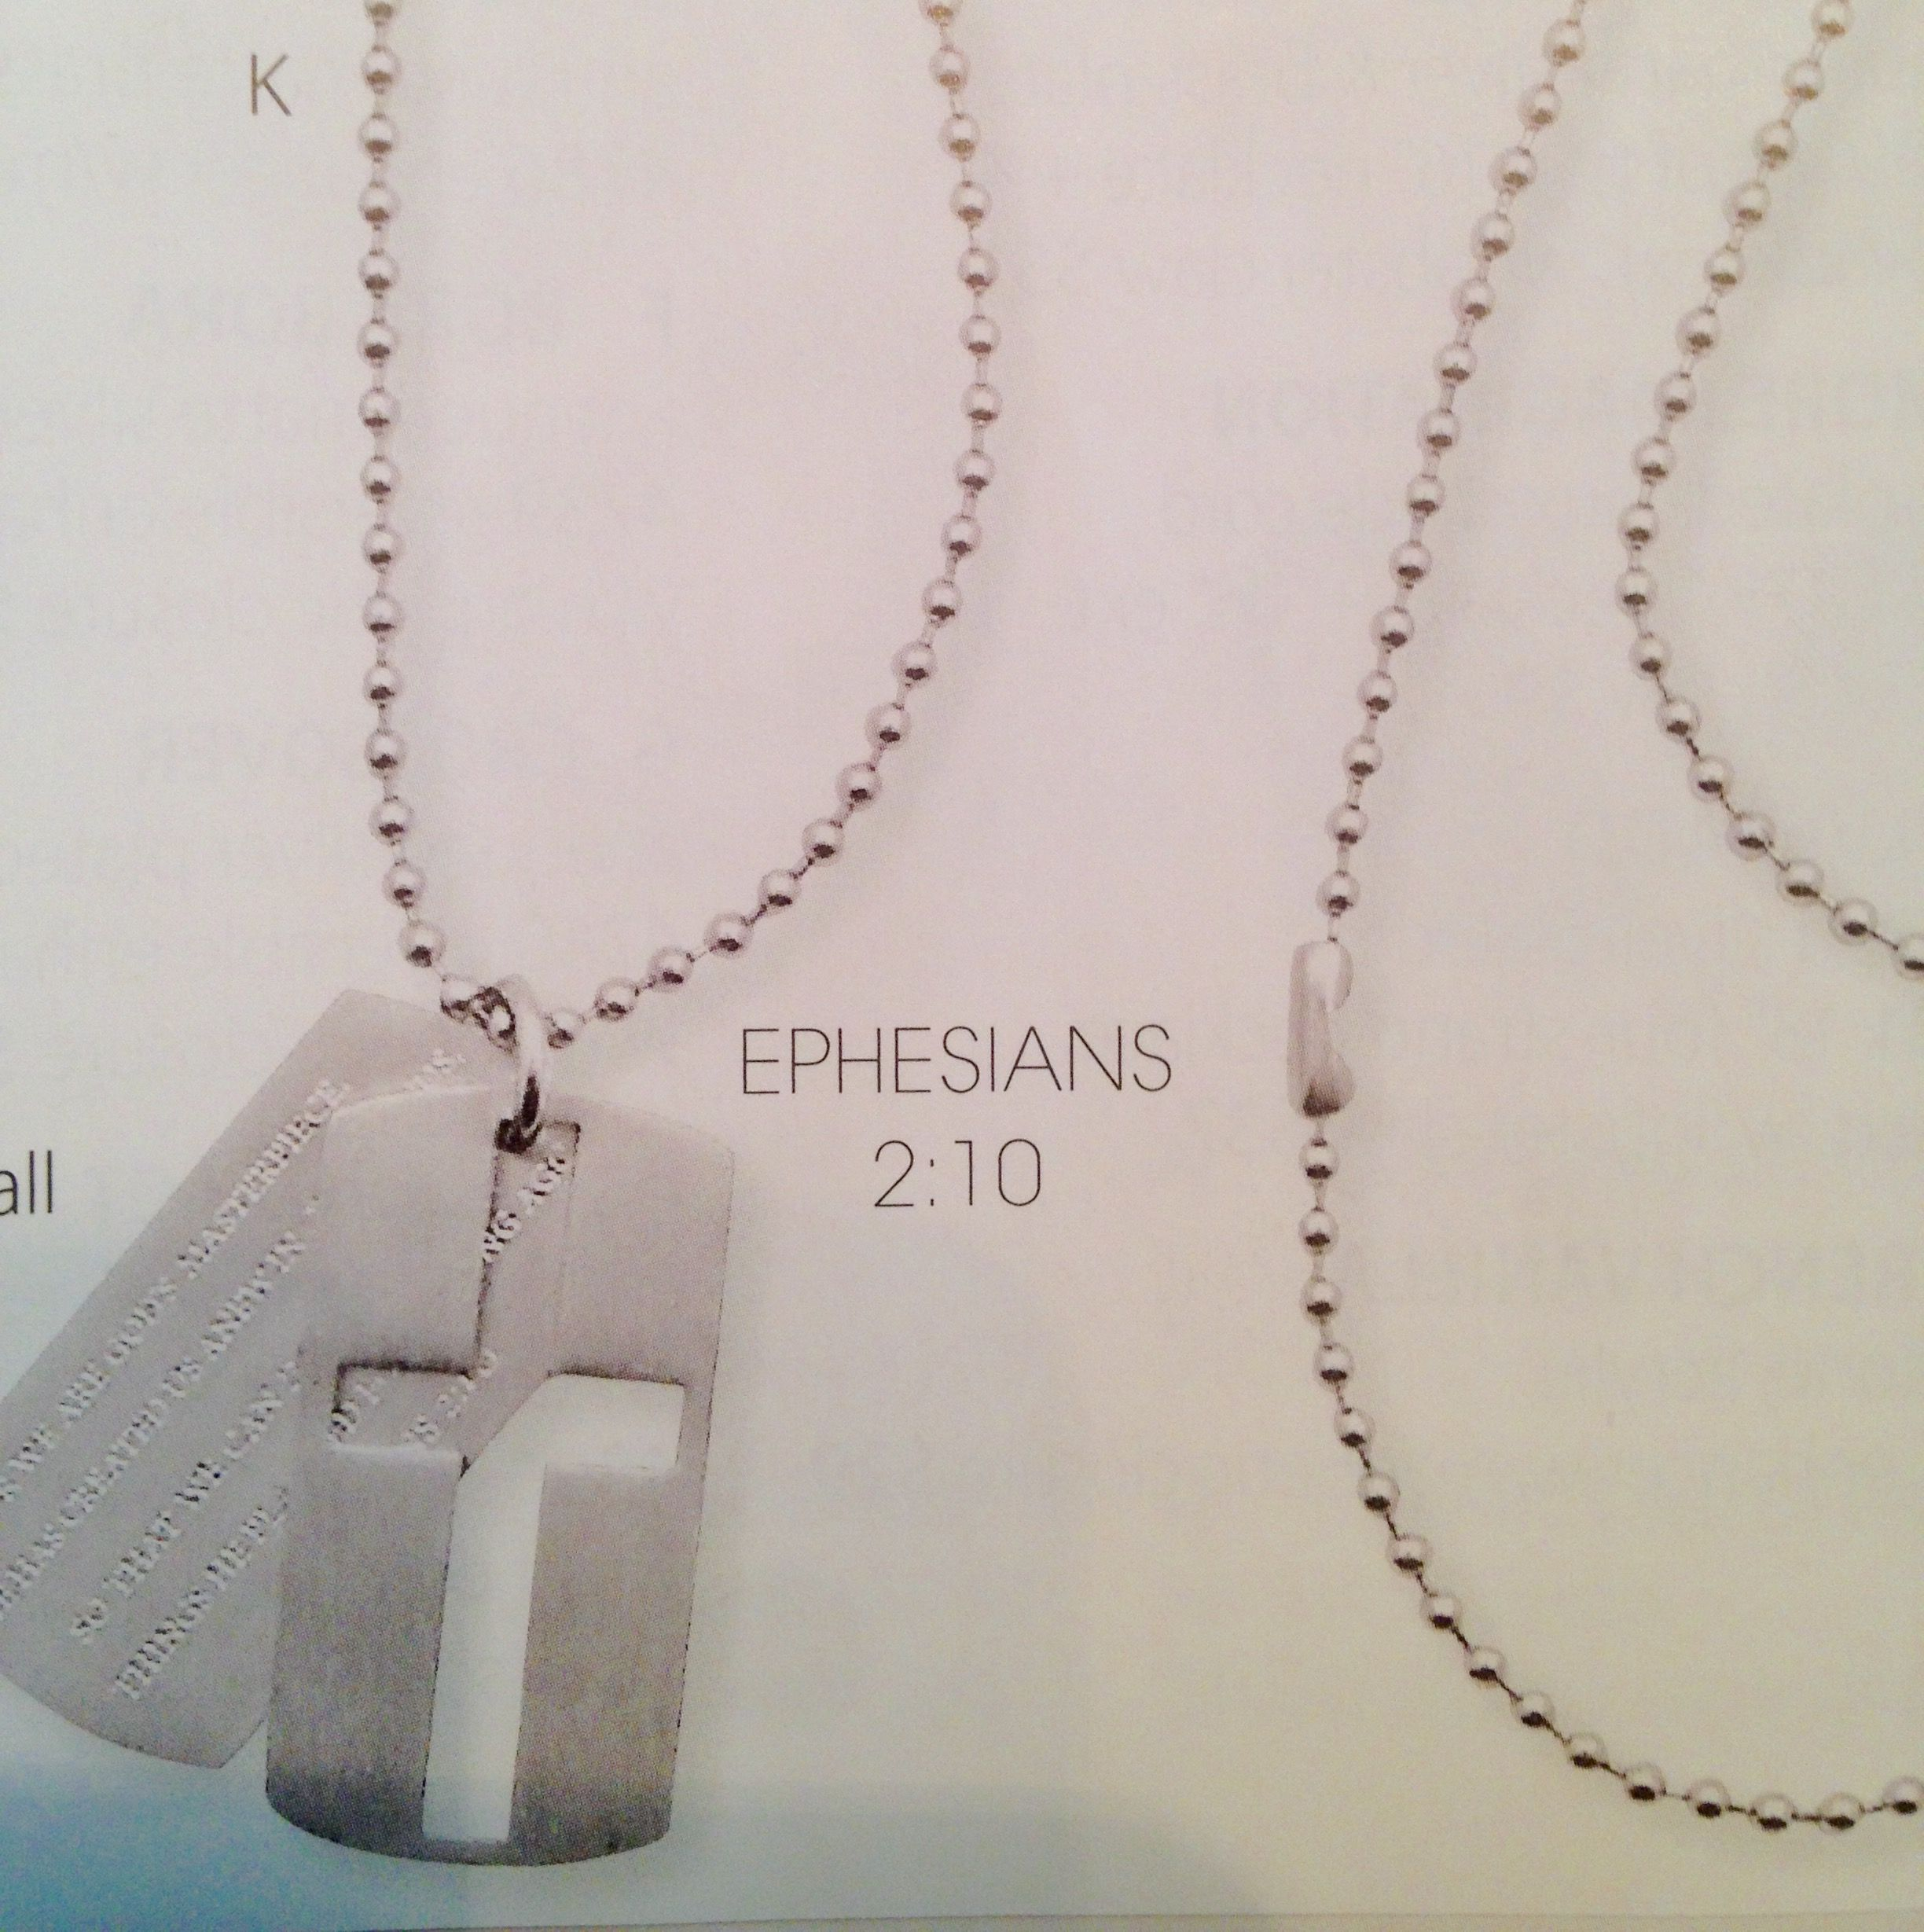 Premier designs jewelry 2015 - Premier Jewelry Premier Designs Fall 2015 Jewelery